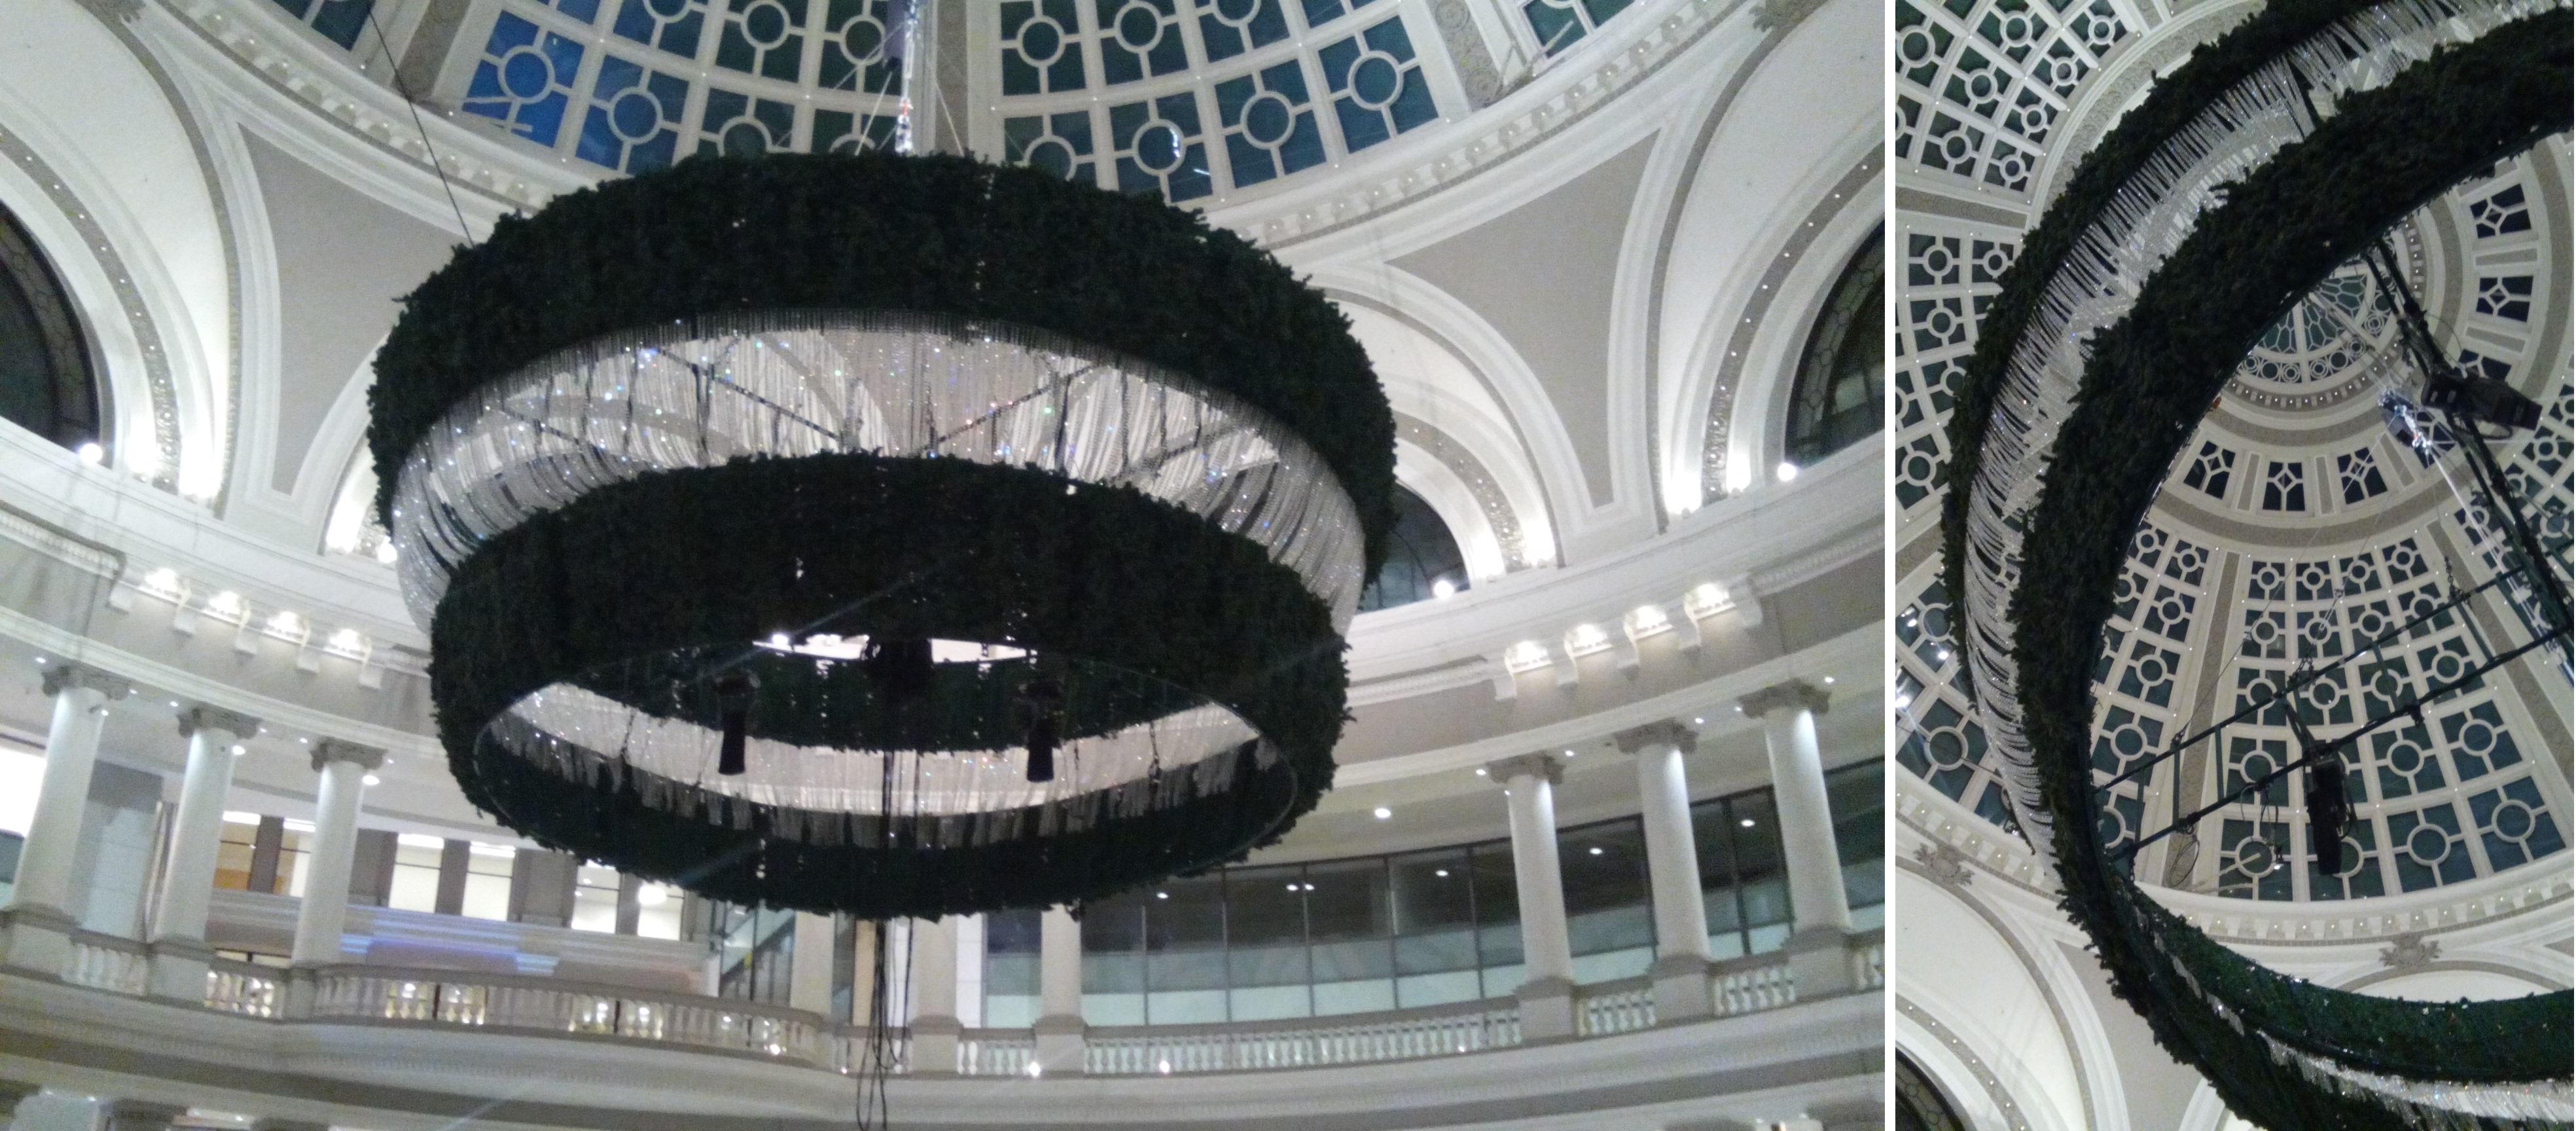 Black Upside Down Christmas Tree